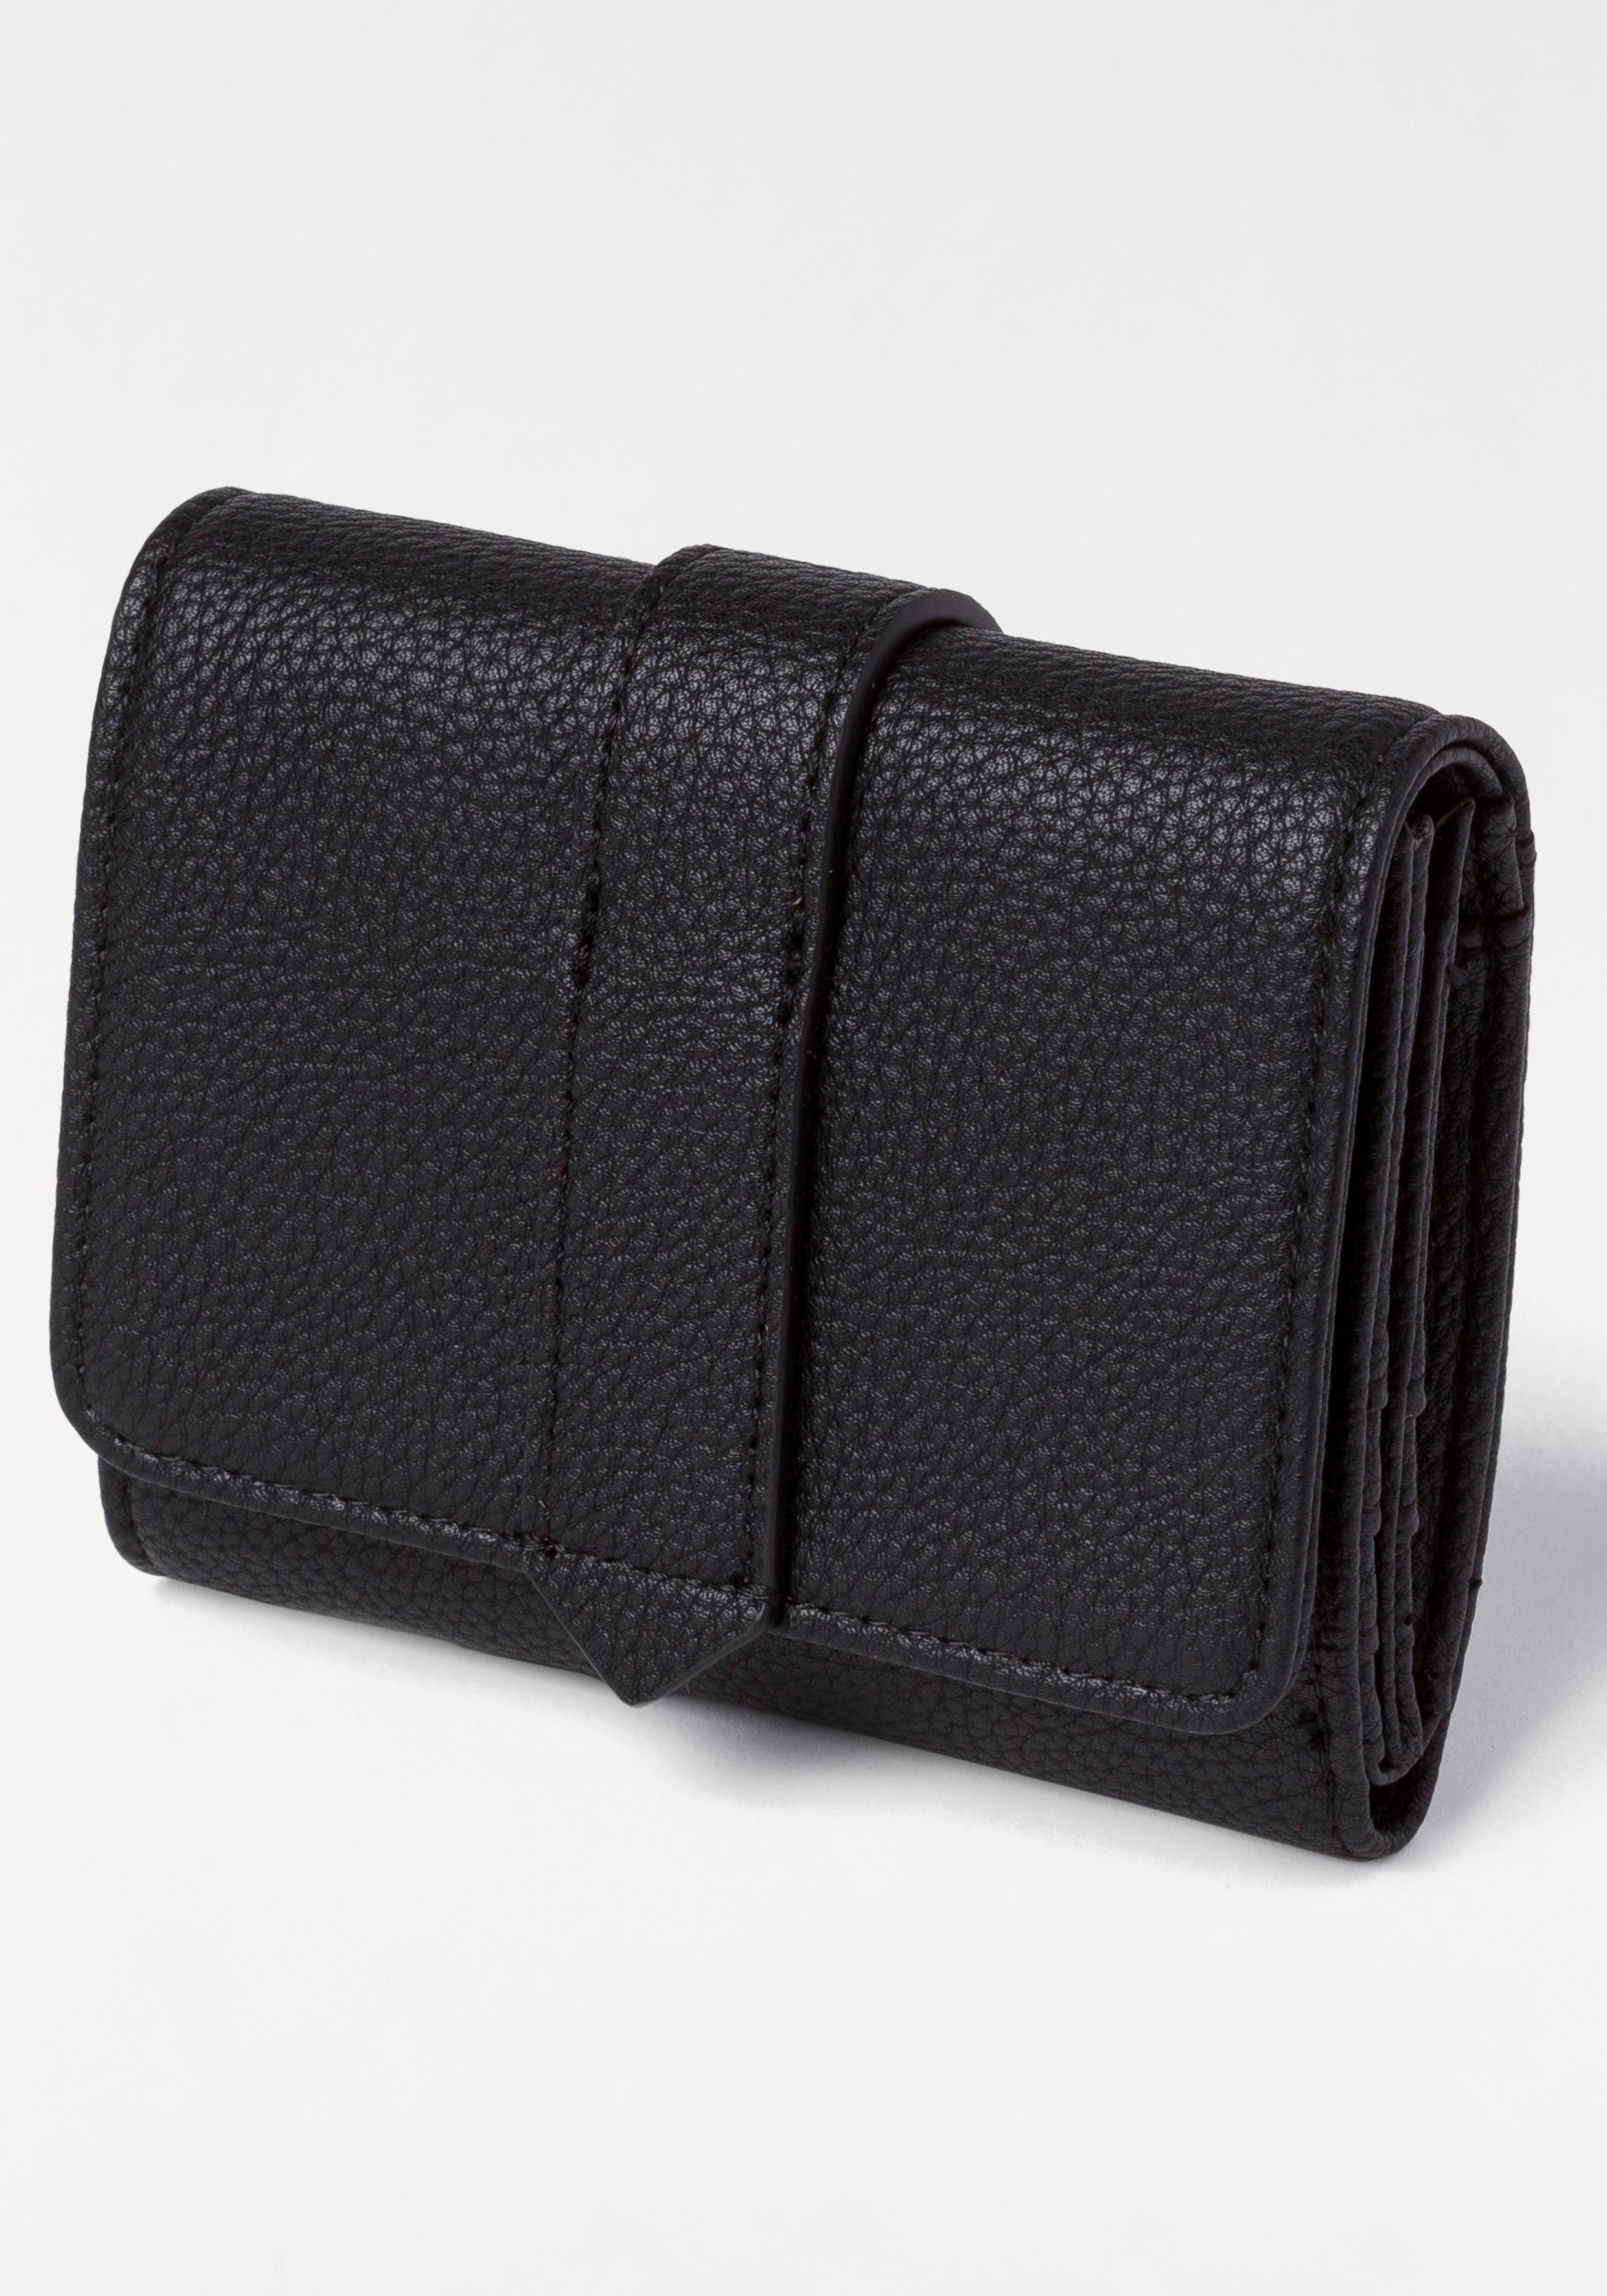 9246fe2ce65 Esprit dames portemonnee zwart Zwarte portemonnee dames esprit ...